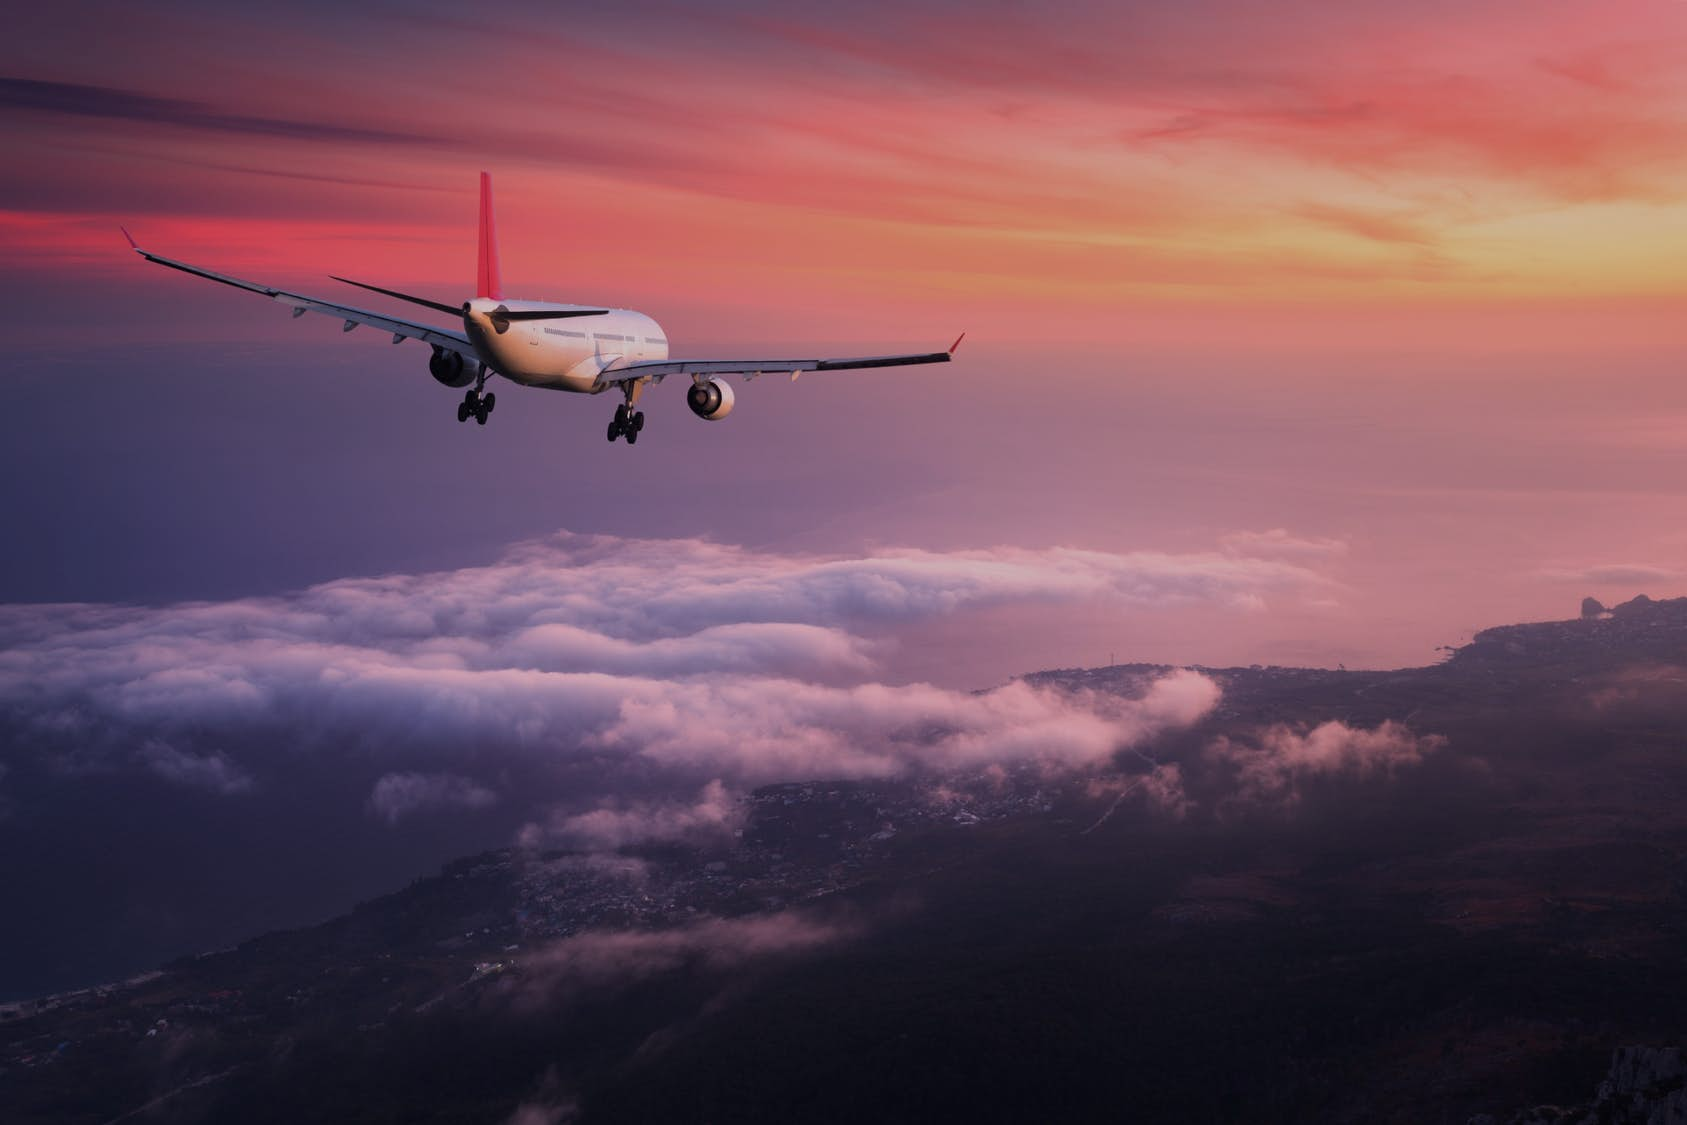 Why I believe we need to start traveling internationally again